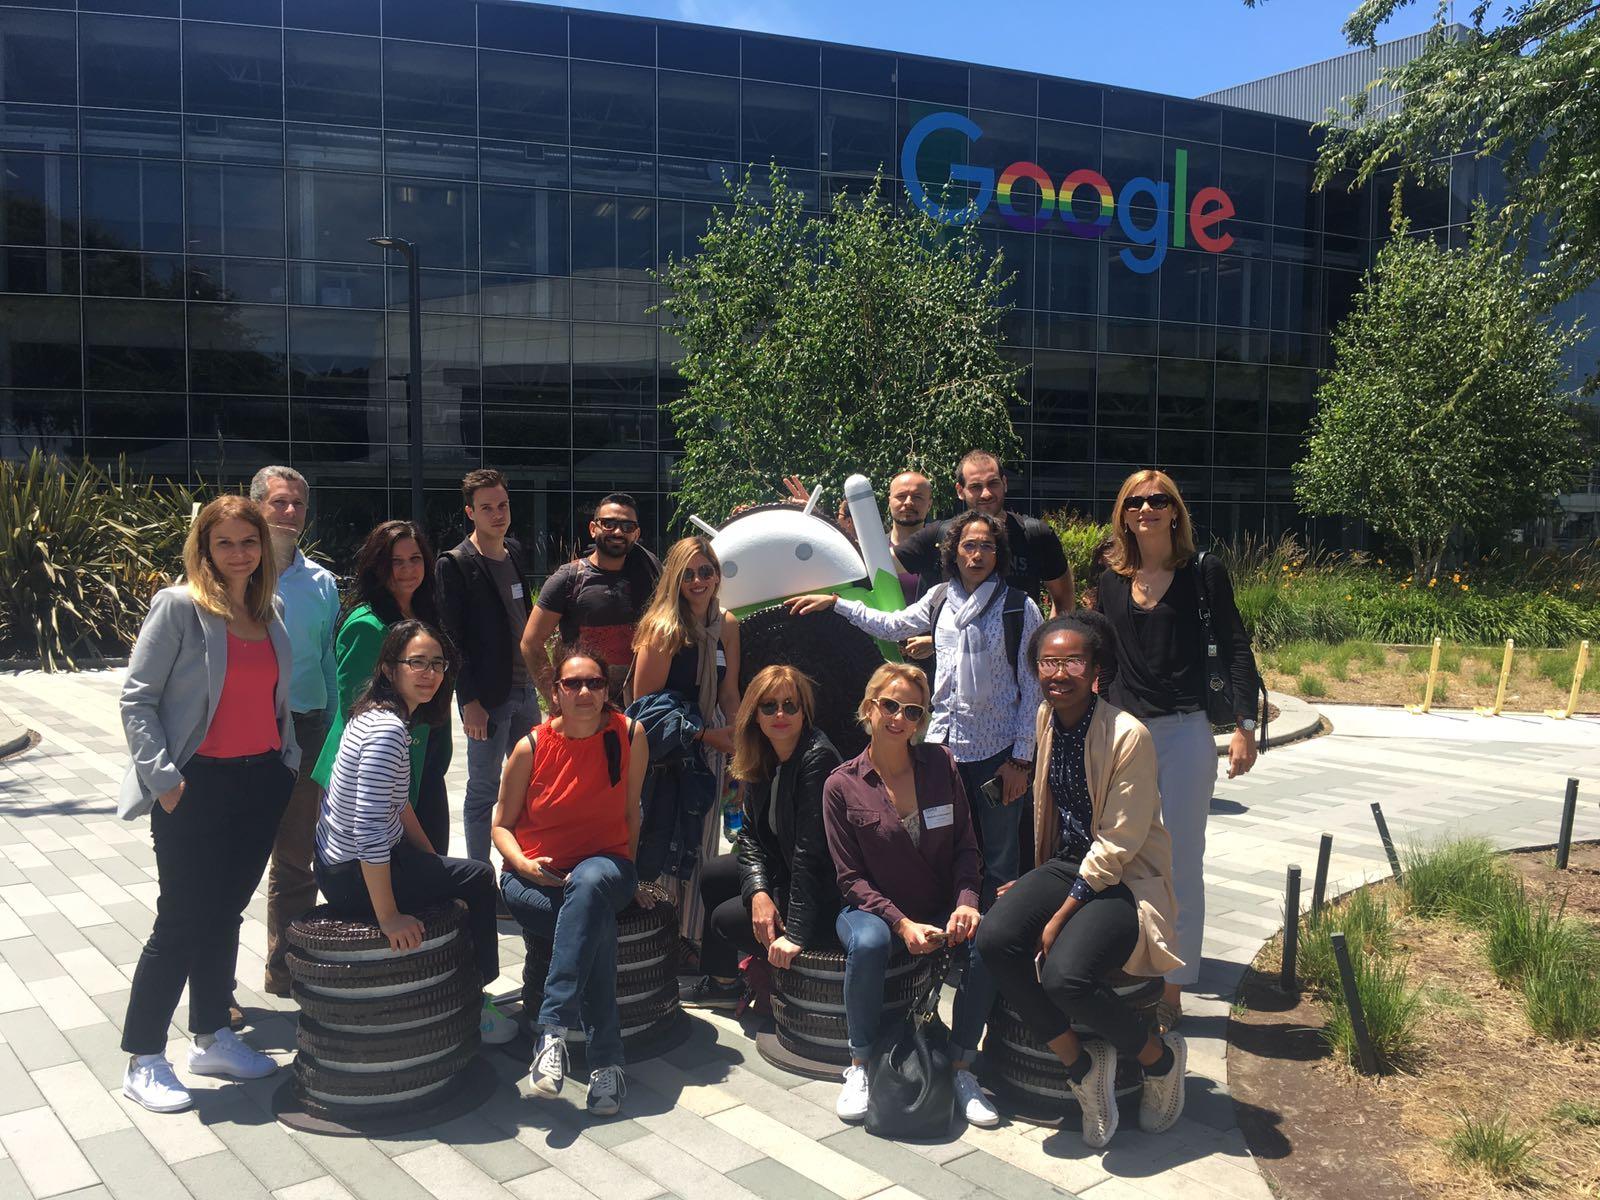 Visite du Googleplex